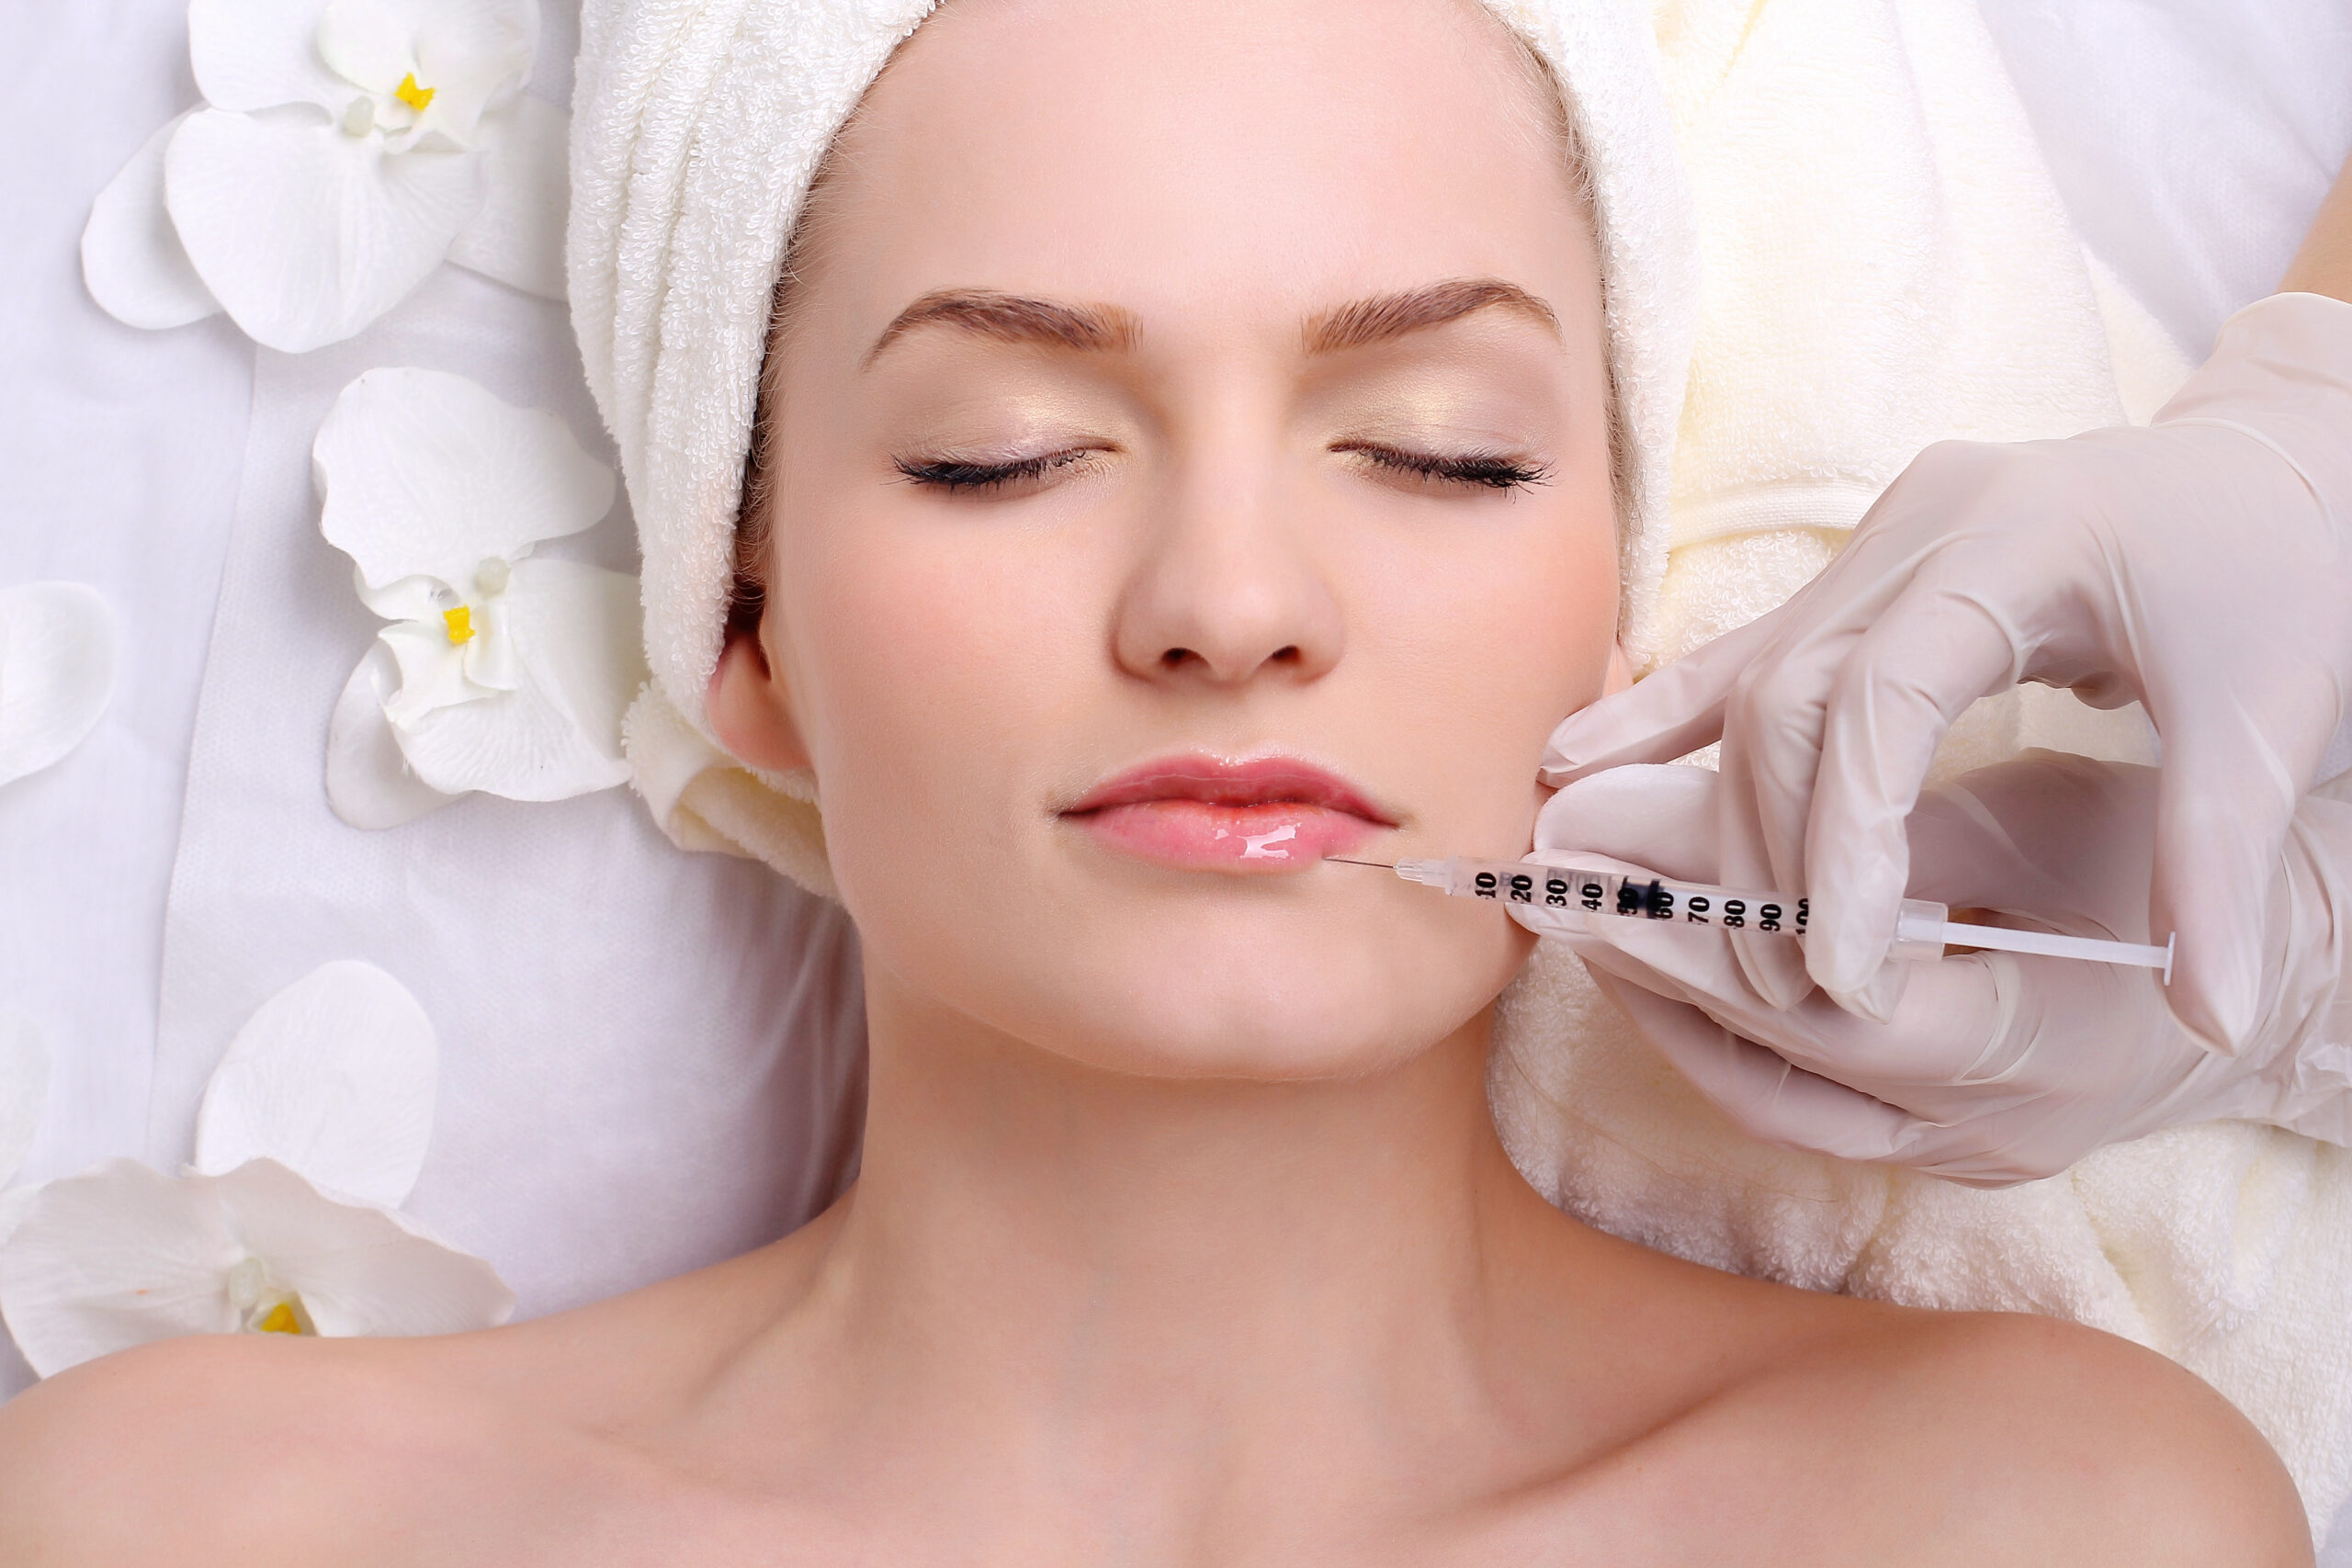 Mesoterapia facial Clínica FEMM